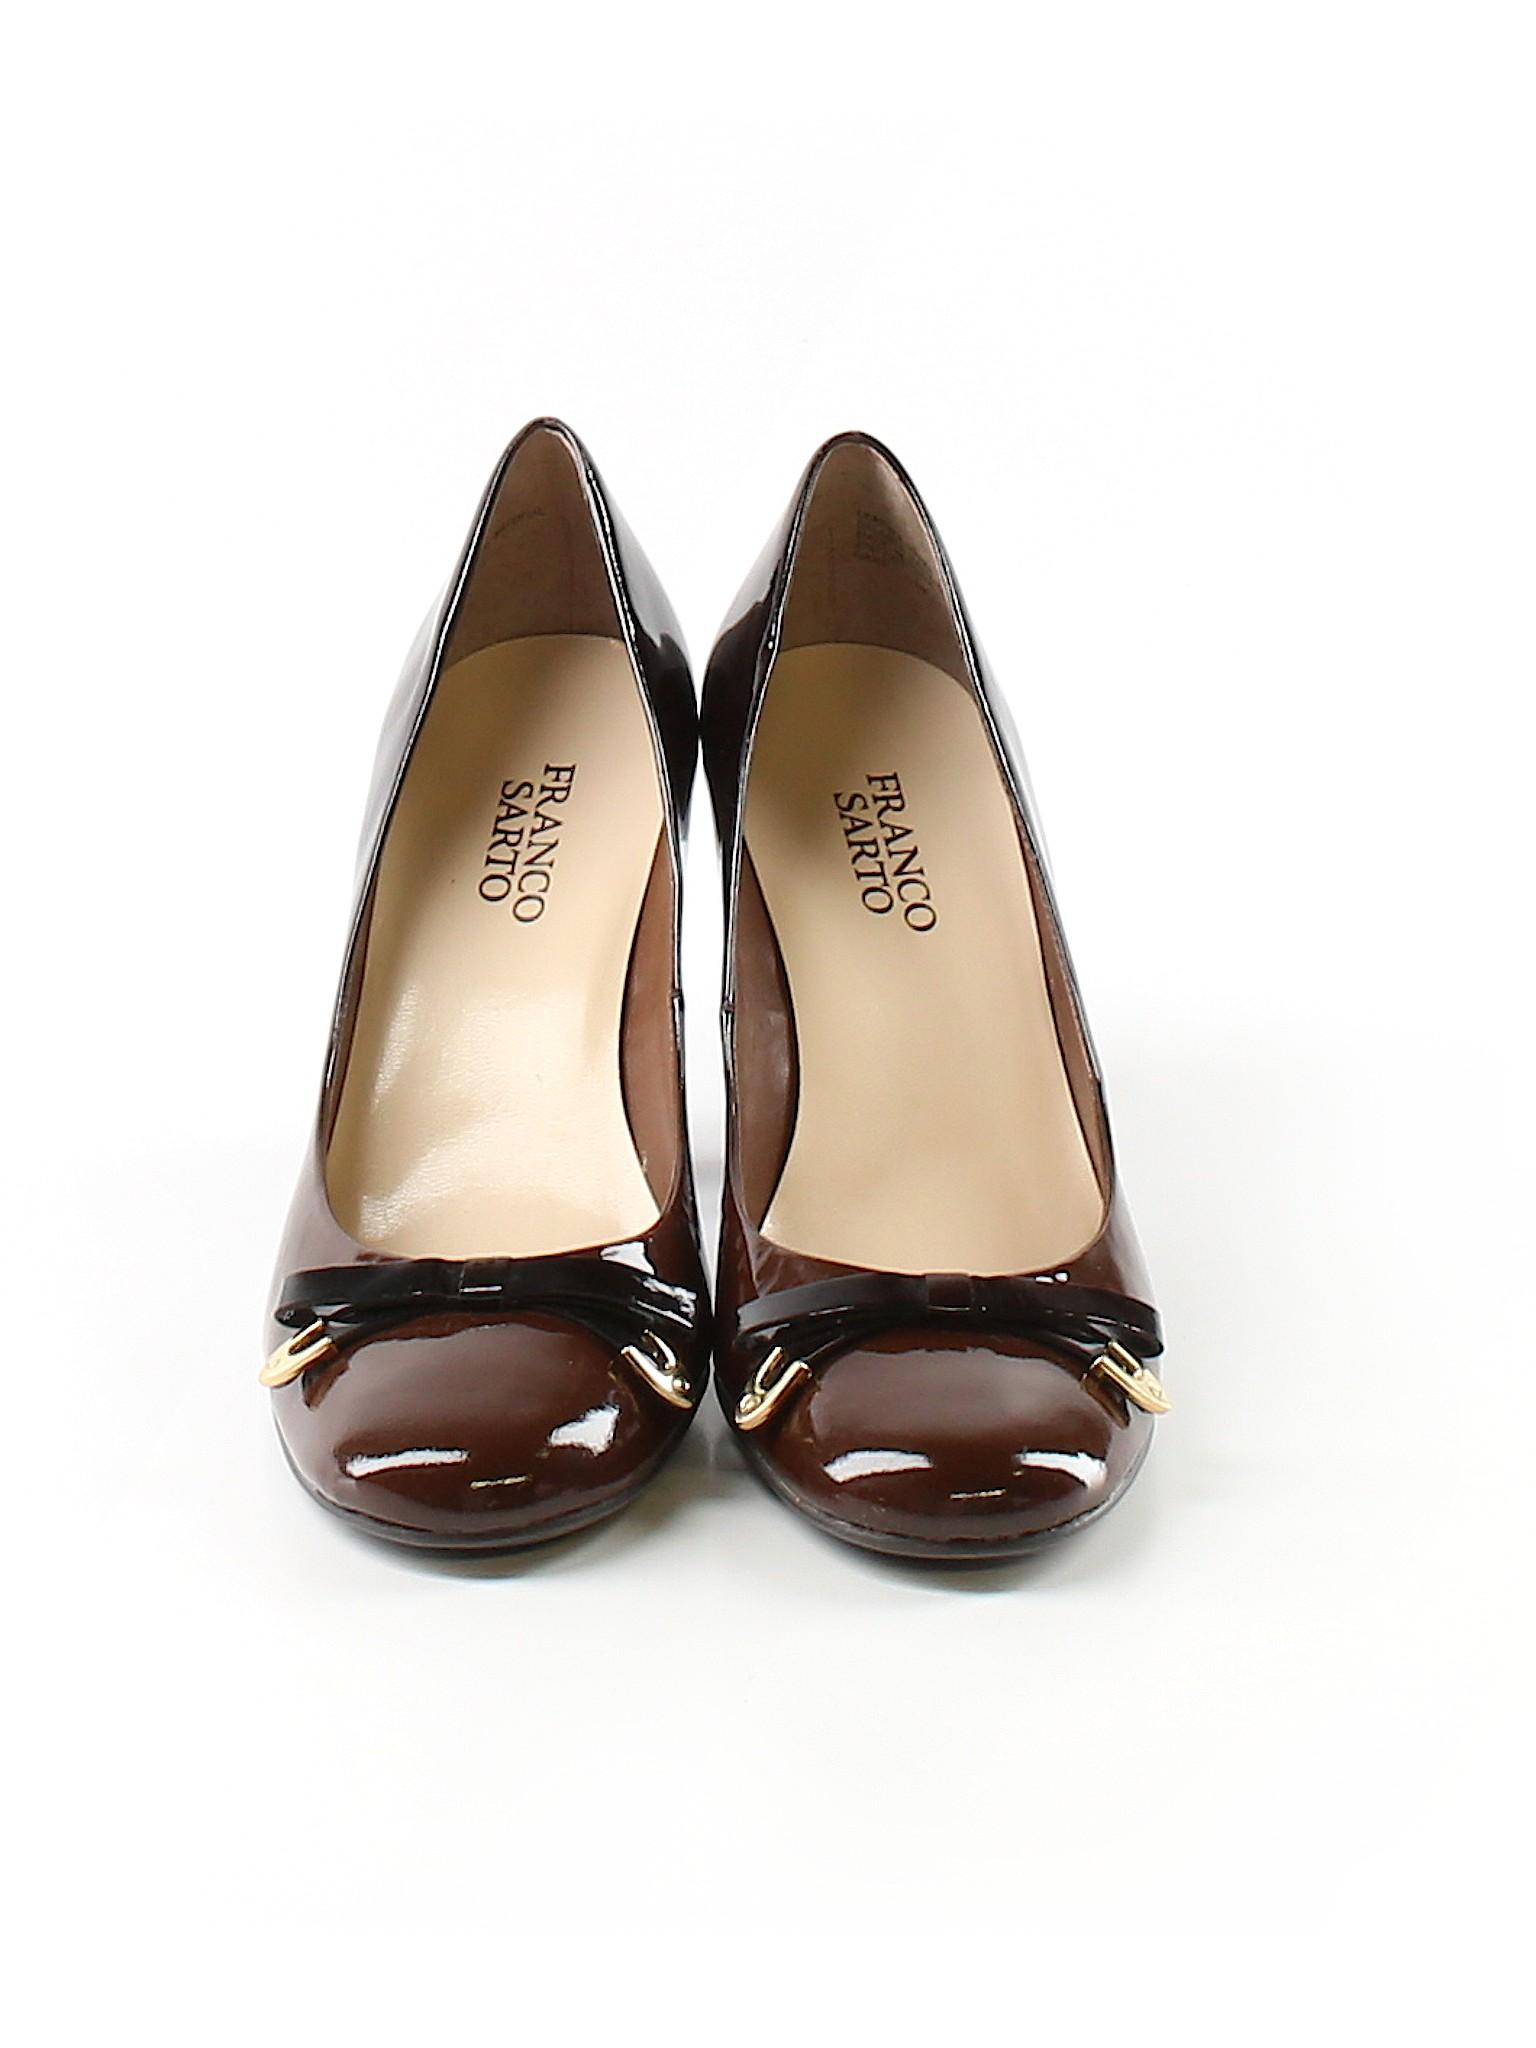 Franco promotion Franco Boutique promotion Heels Boutique Sarto gwqx7I